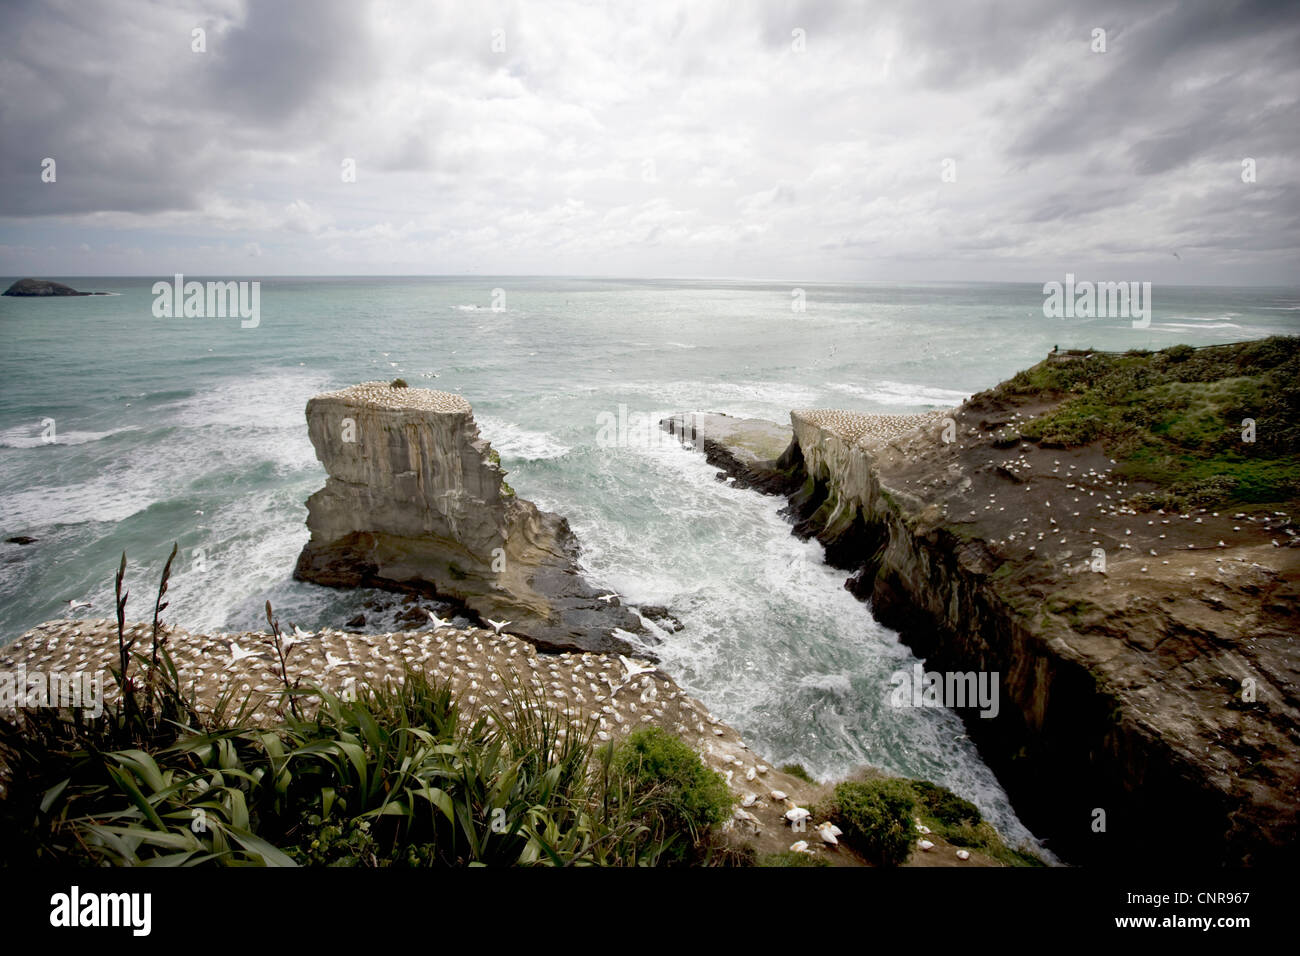 Craggy rocks jutting into ocean - Stock Image